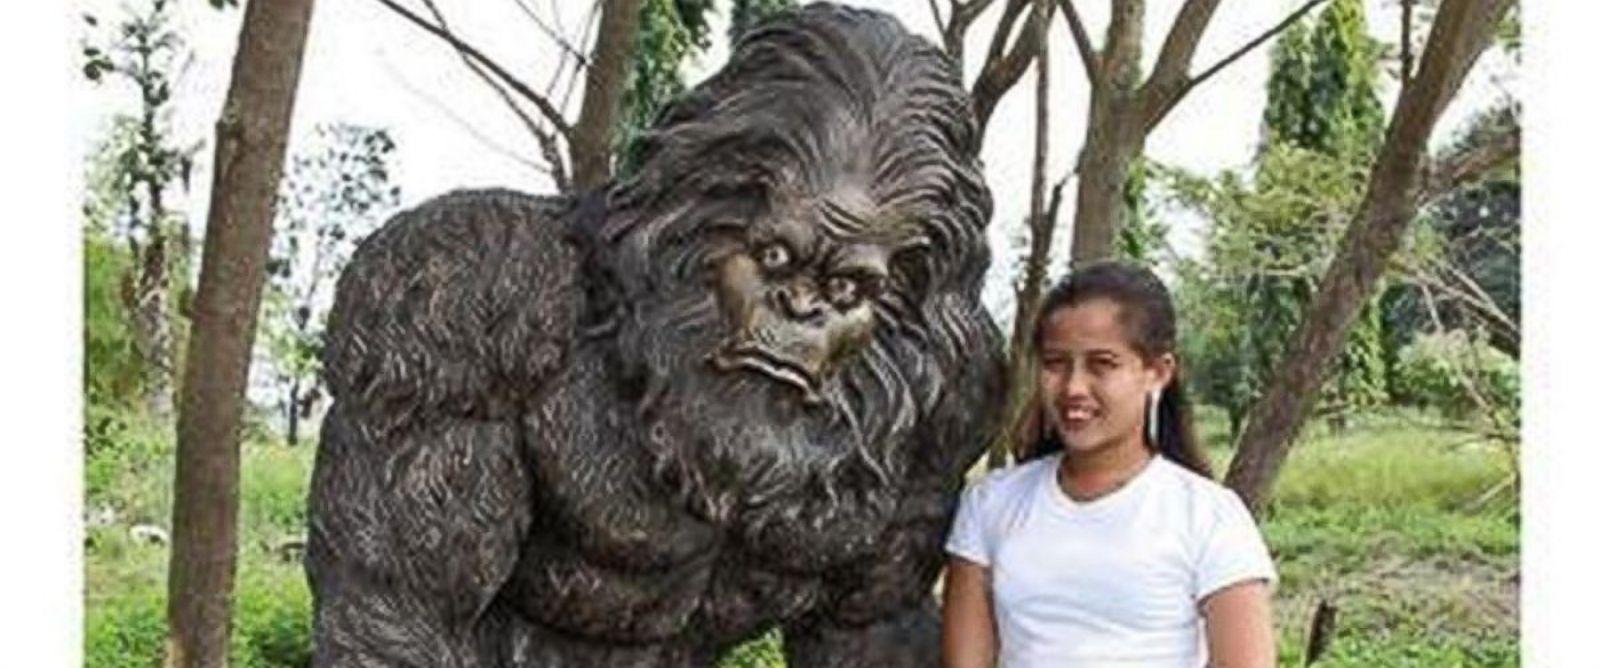 SkyMall Christmas Nightmare: Battles with Bigfoot - ABC News